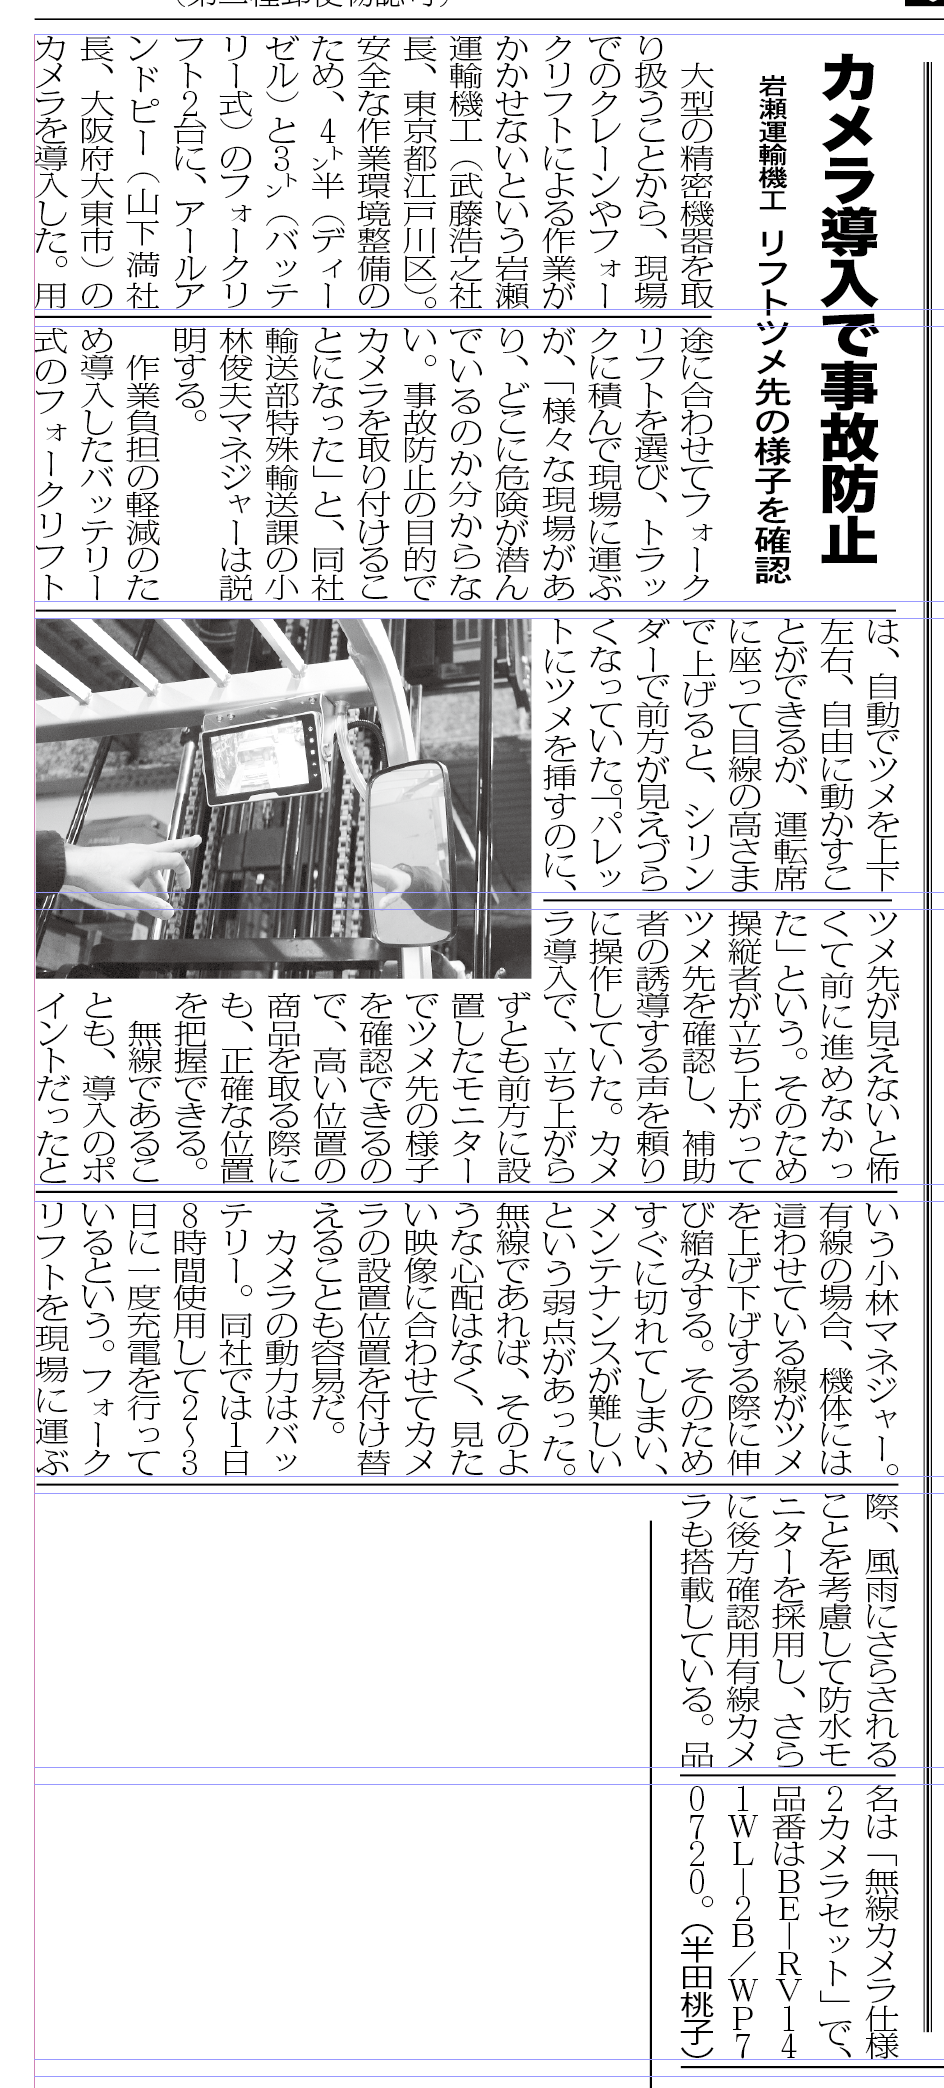 https://www.r-p-jp.com/work/c-work/86.html